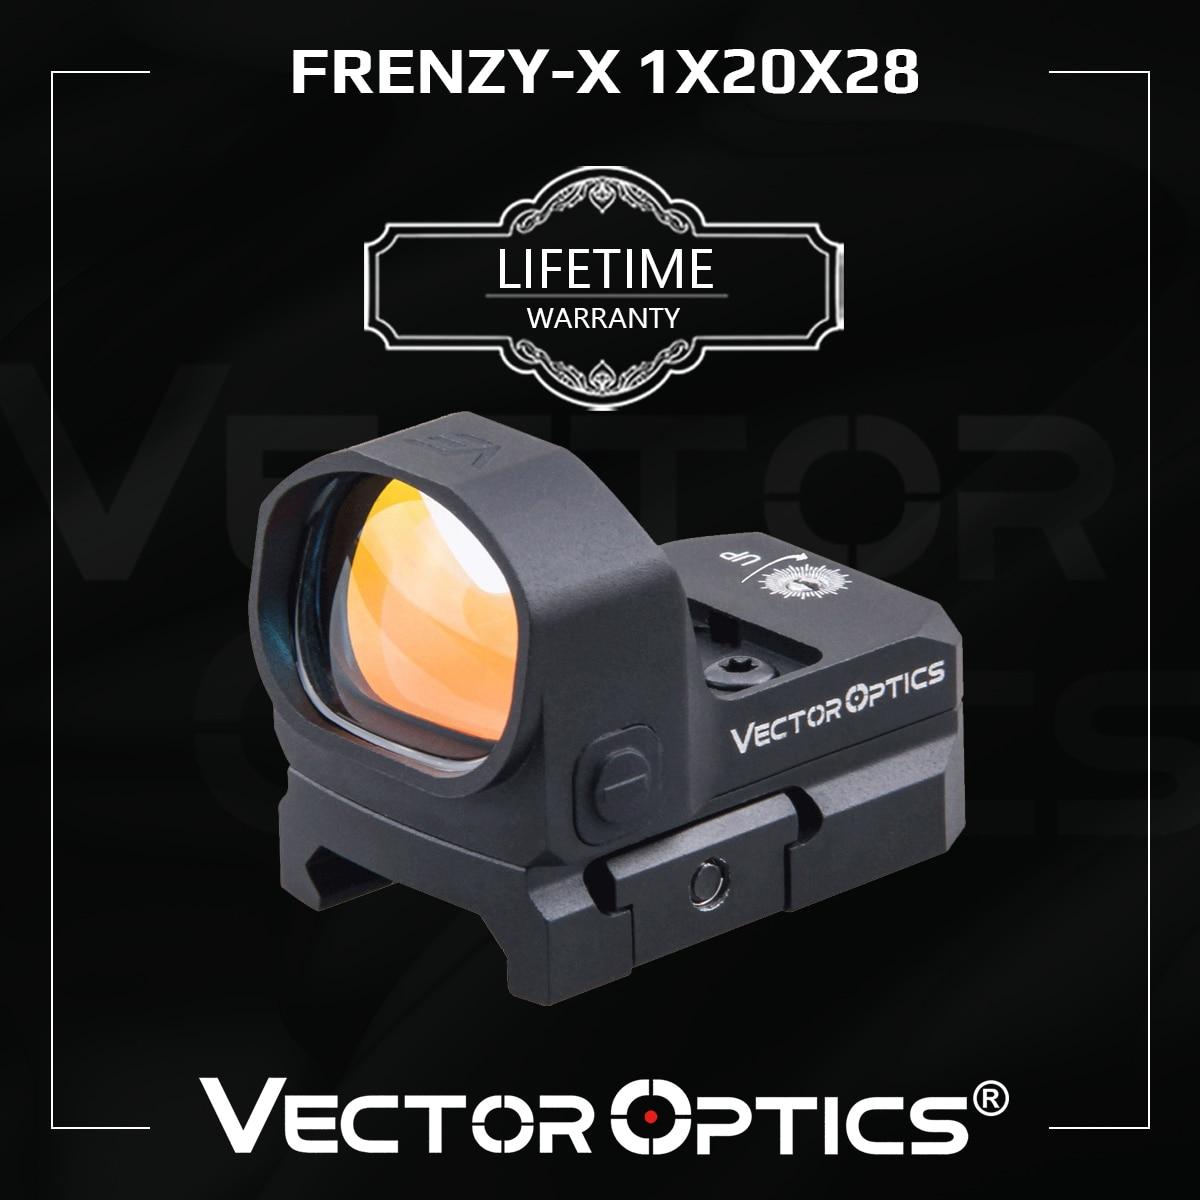 Kit Mirino a Punto Rosso per Pistole Glock VECTOR OPTICS 1x20x28 Red Dot Frenzy